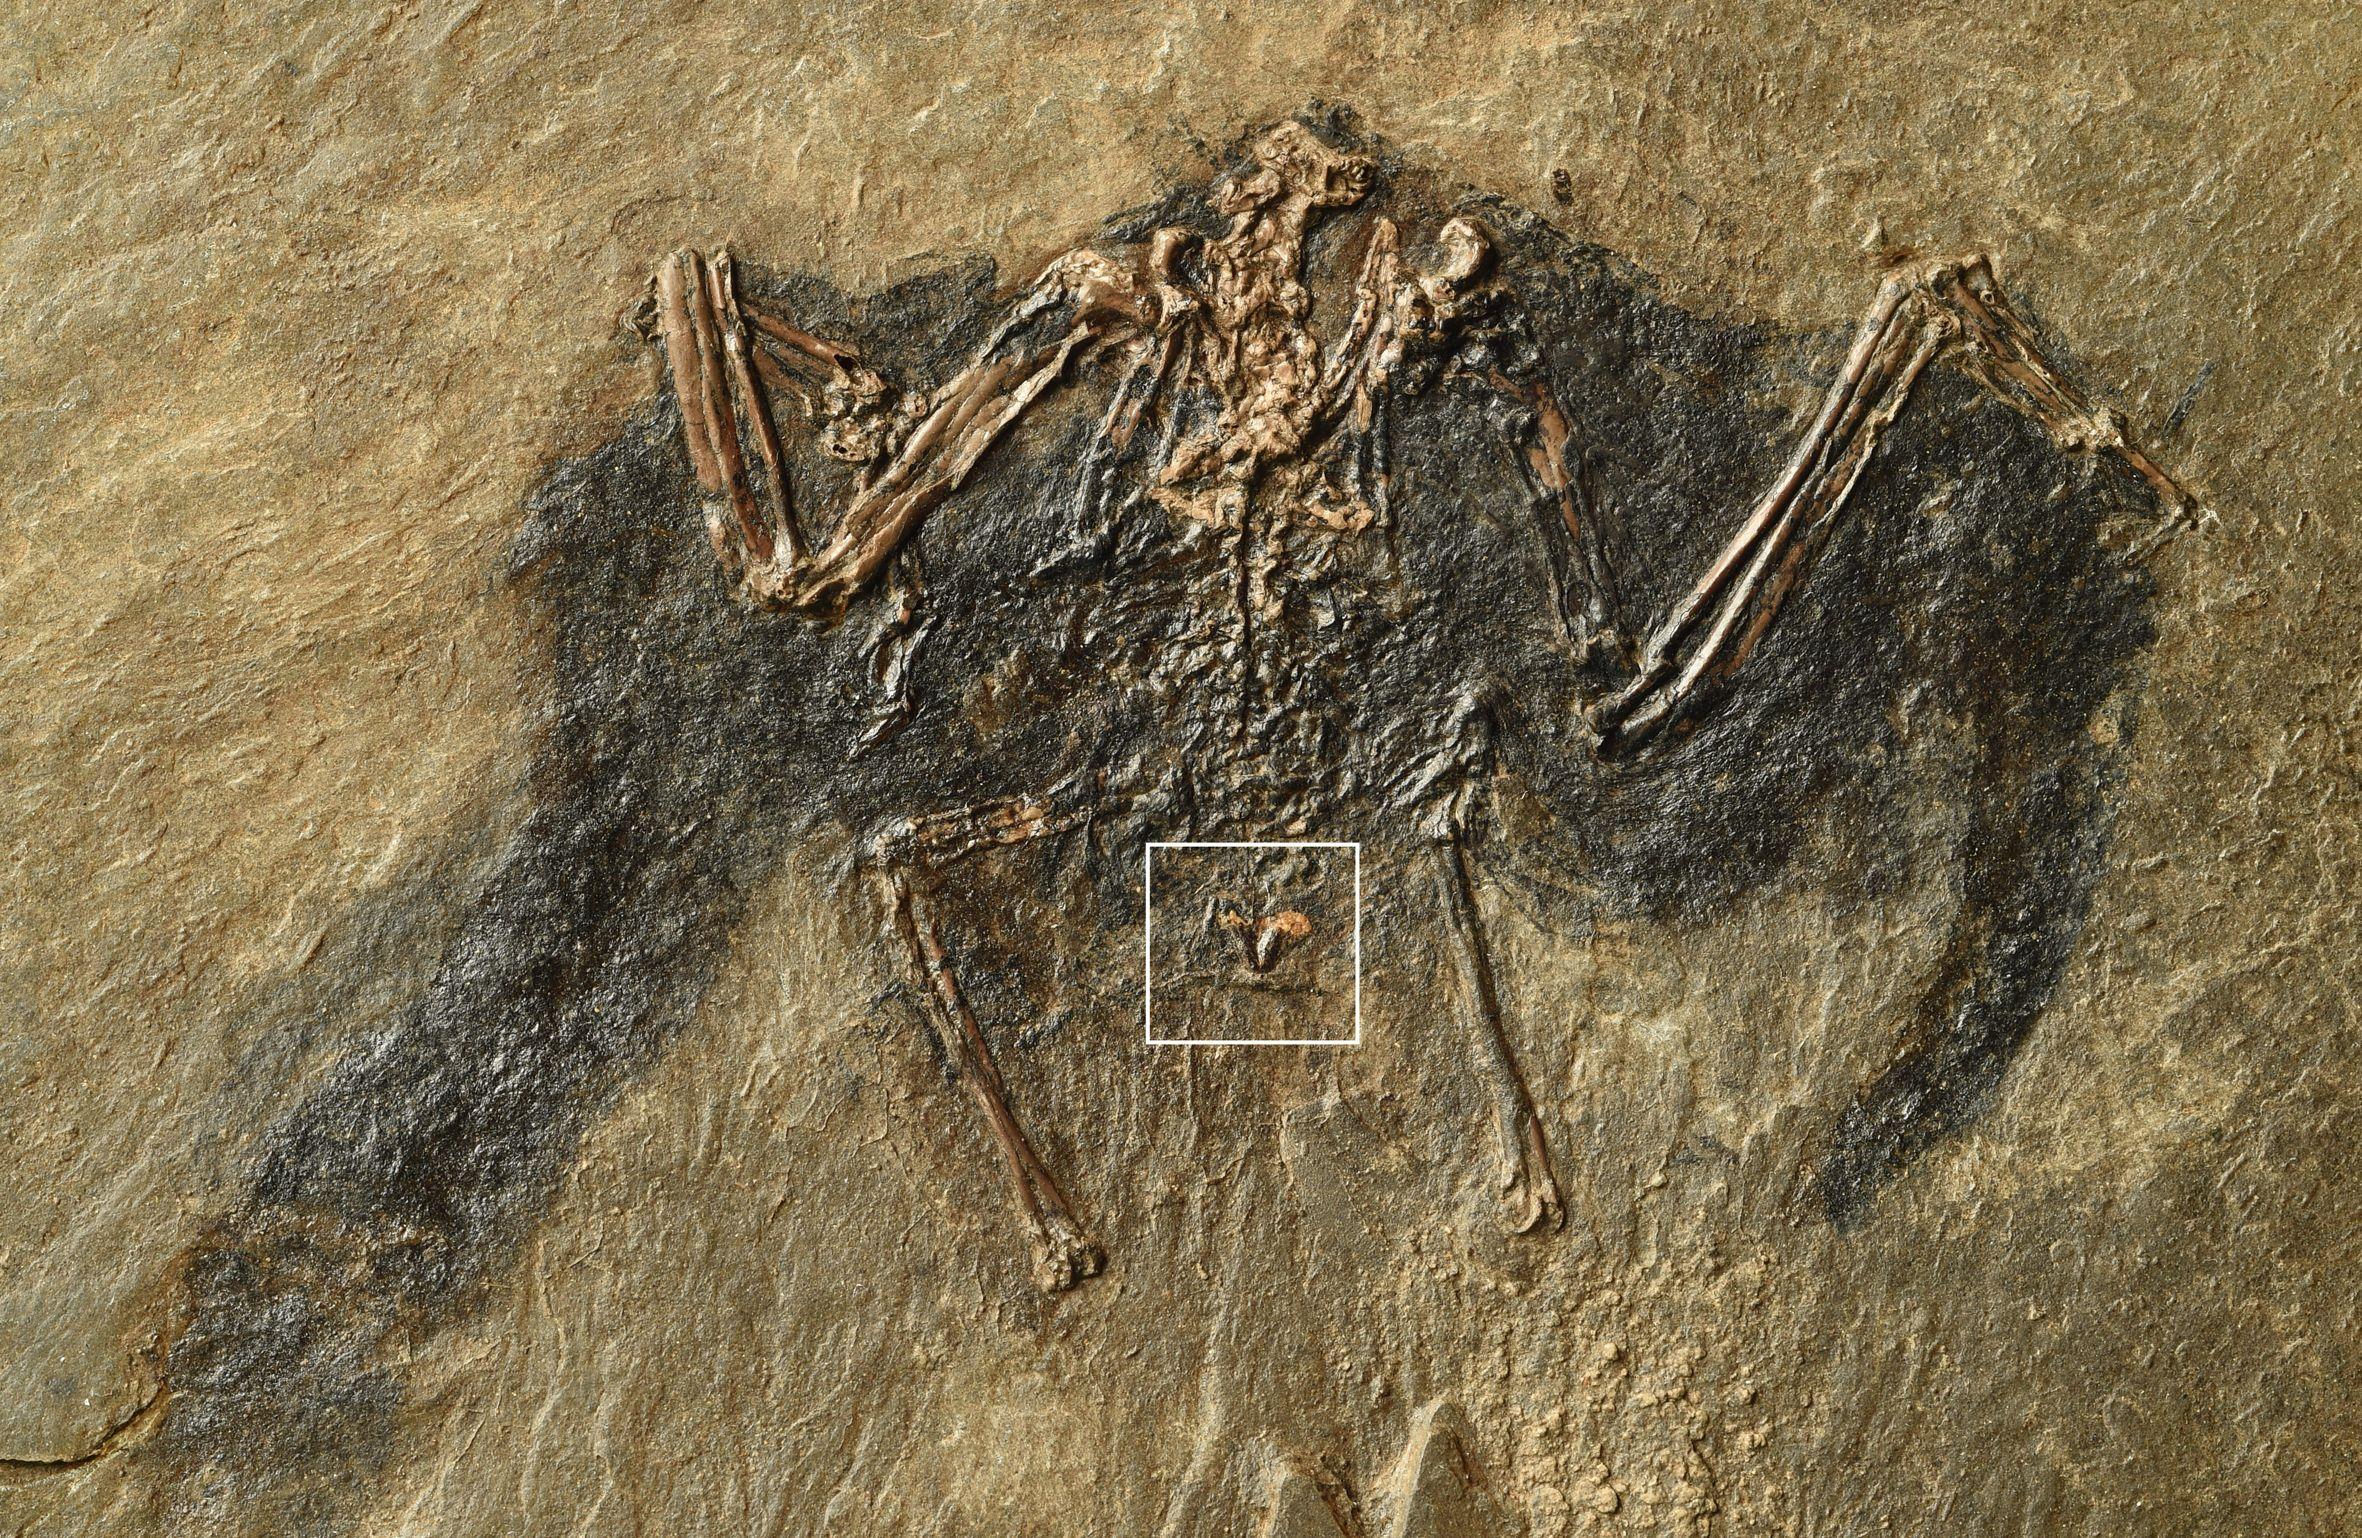 fossil_bird_gland